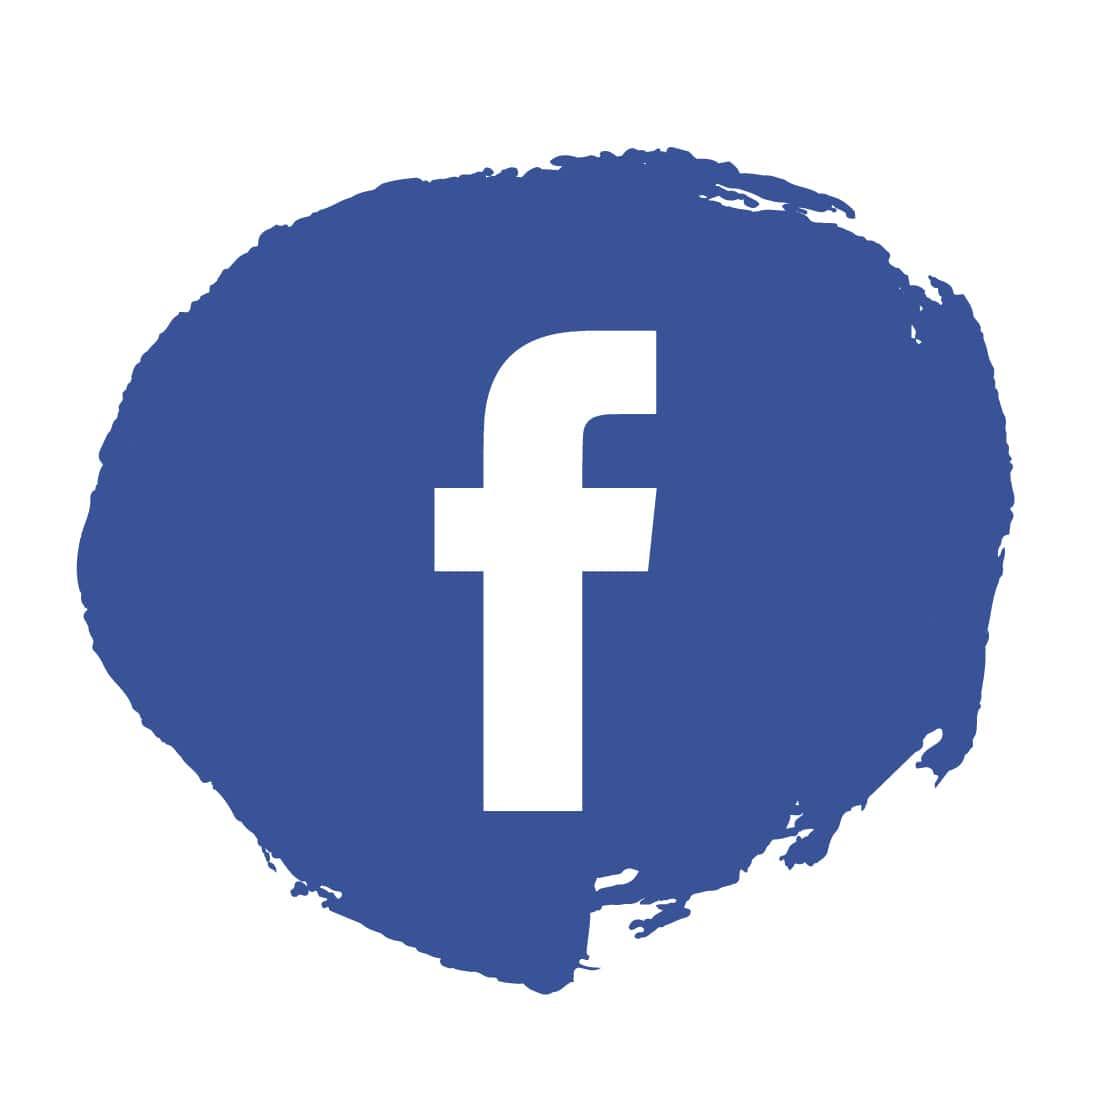 dronetraining.co.uk Facebook Group